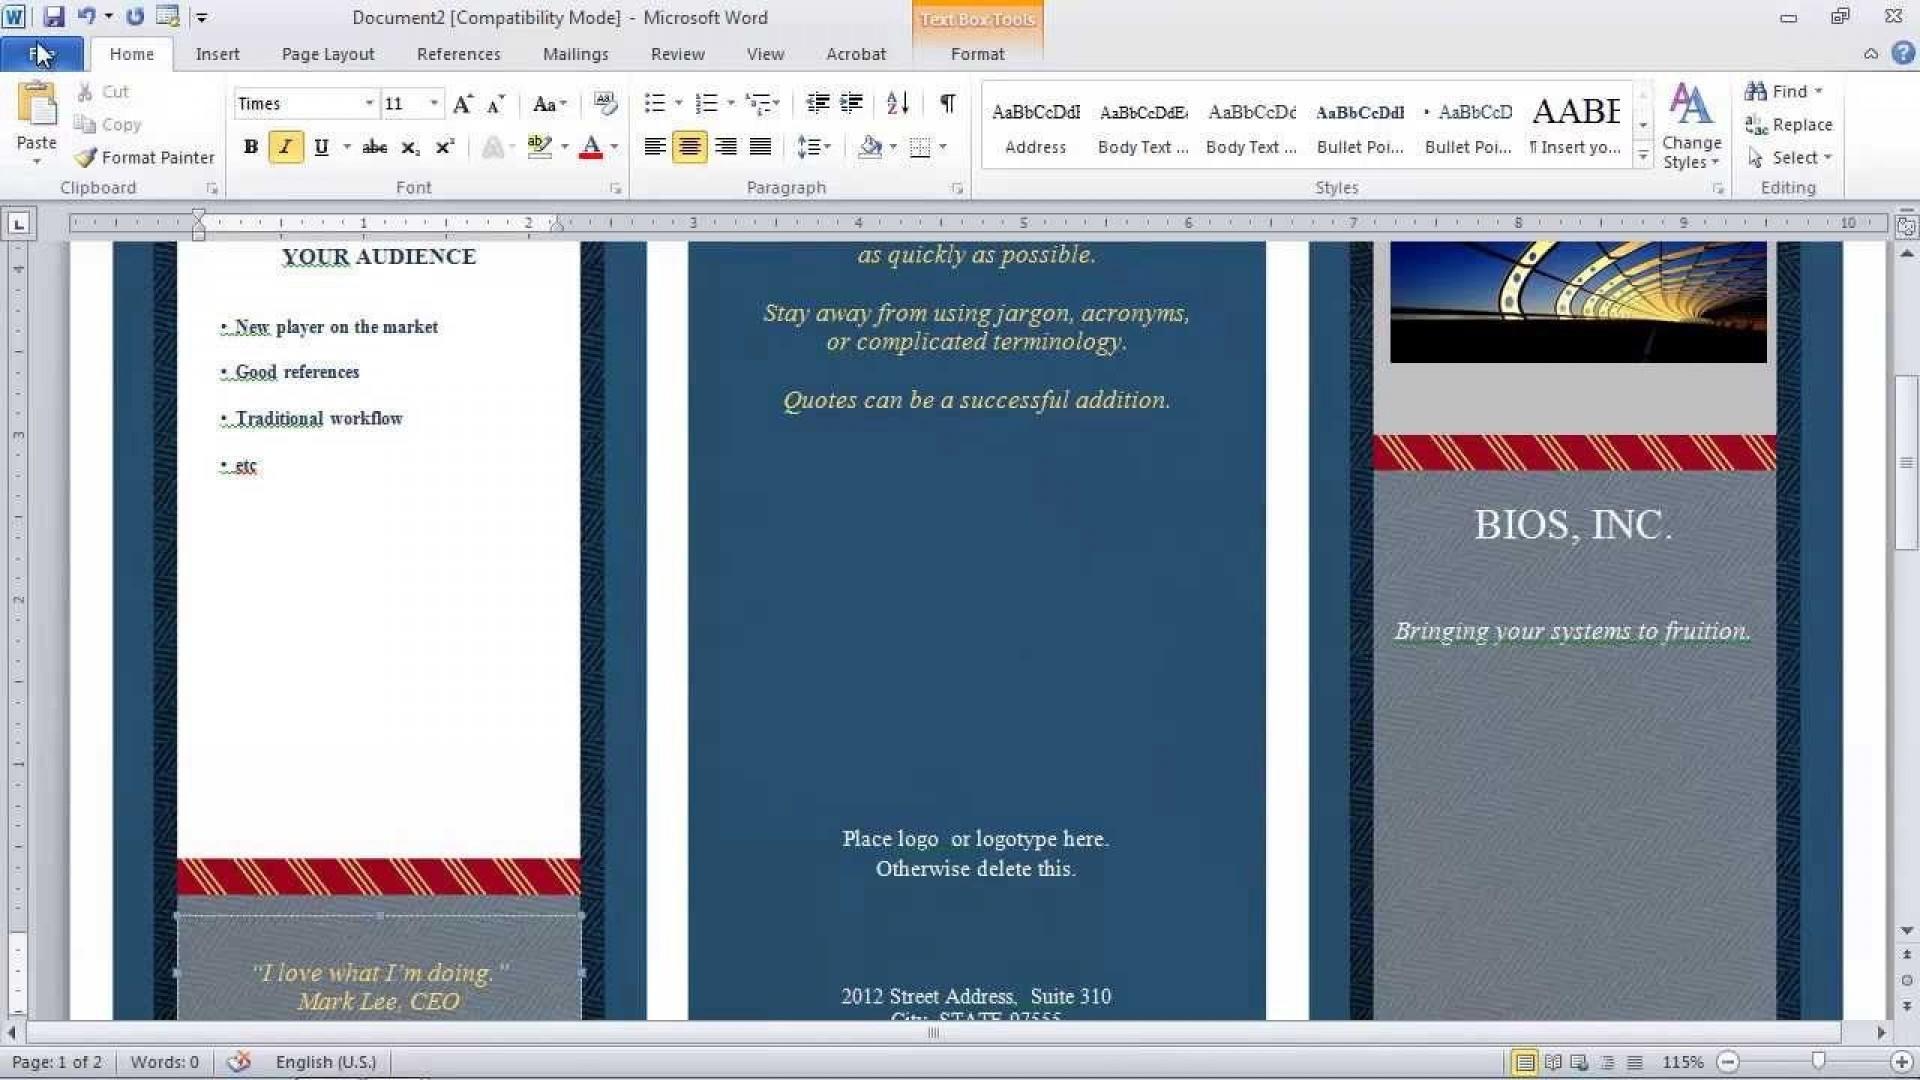 007 Shocking Brochure Template For Word Mac Image  Tri Fold Free1920